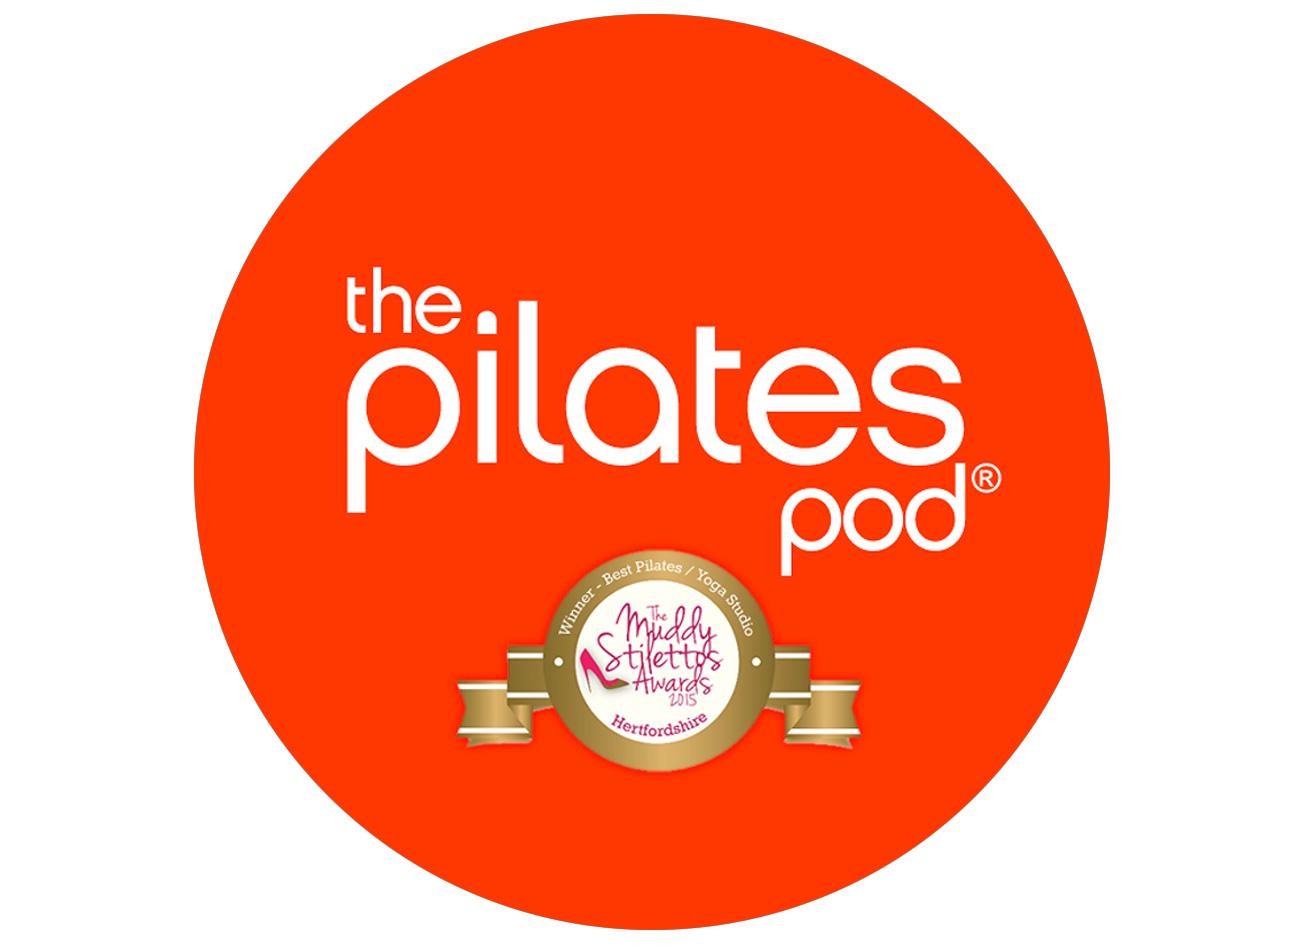 Pilates-pod.jpg